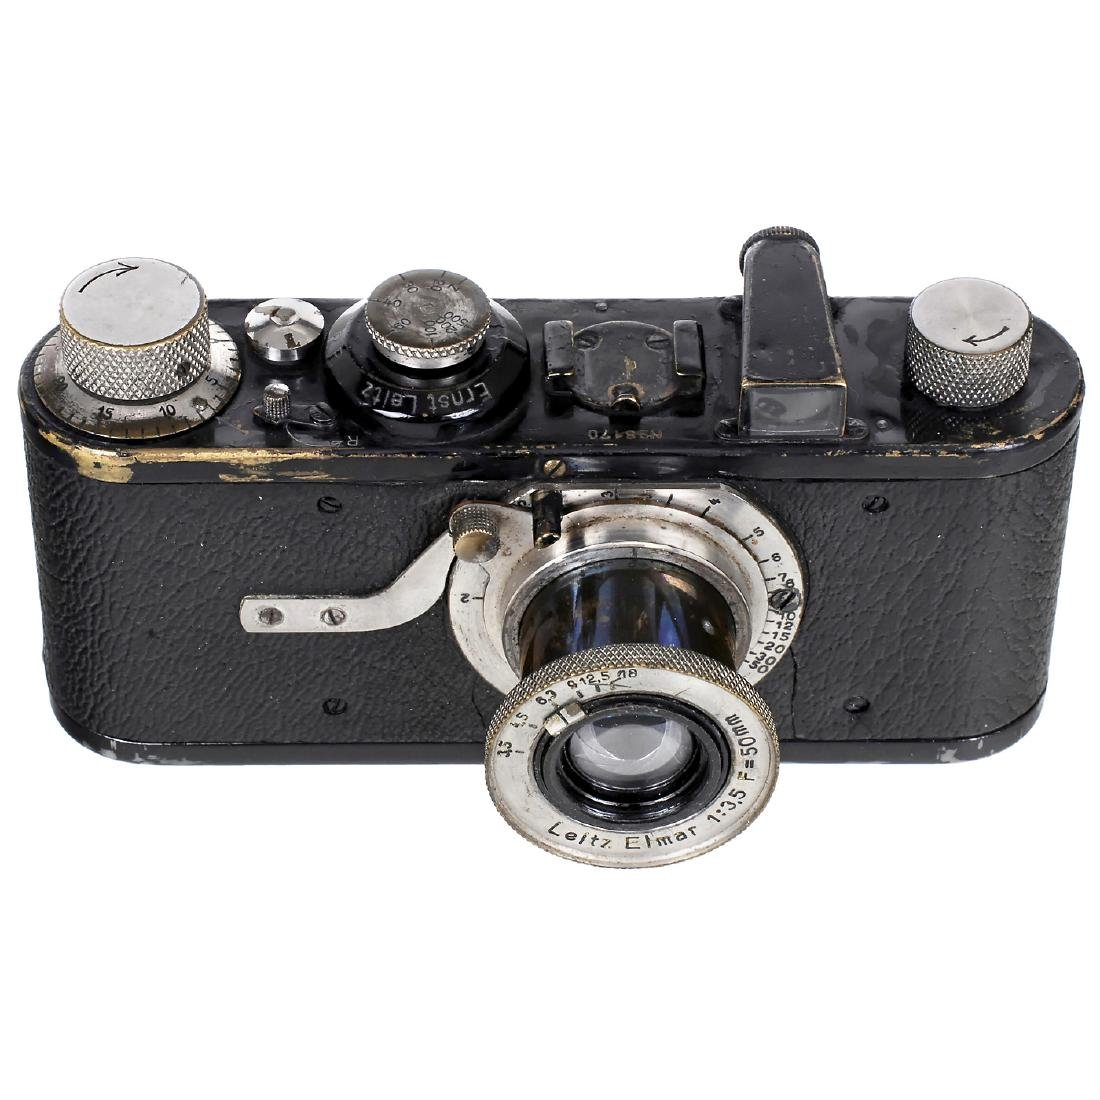 Leica I (A) with Elmar 3,5 (Near-Focus Version), 1928